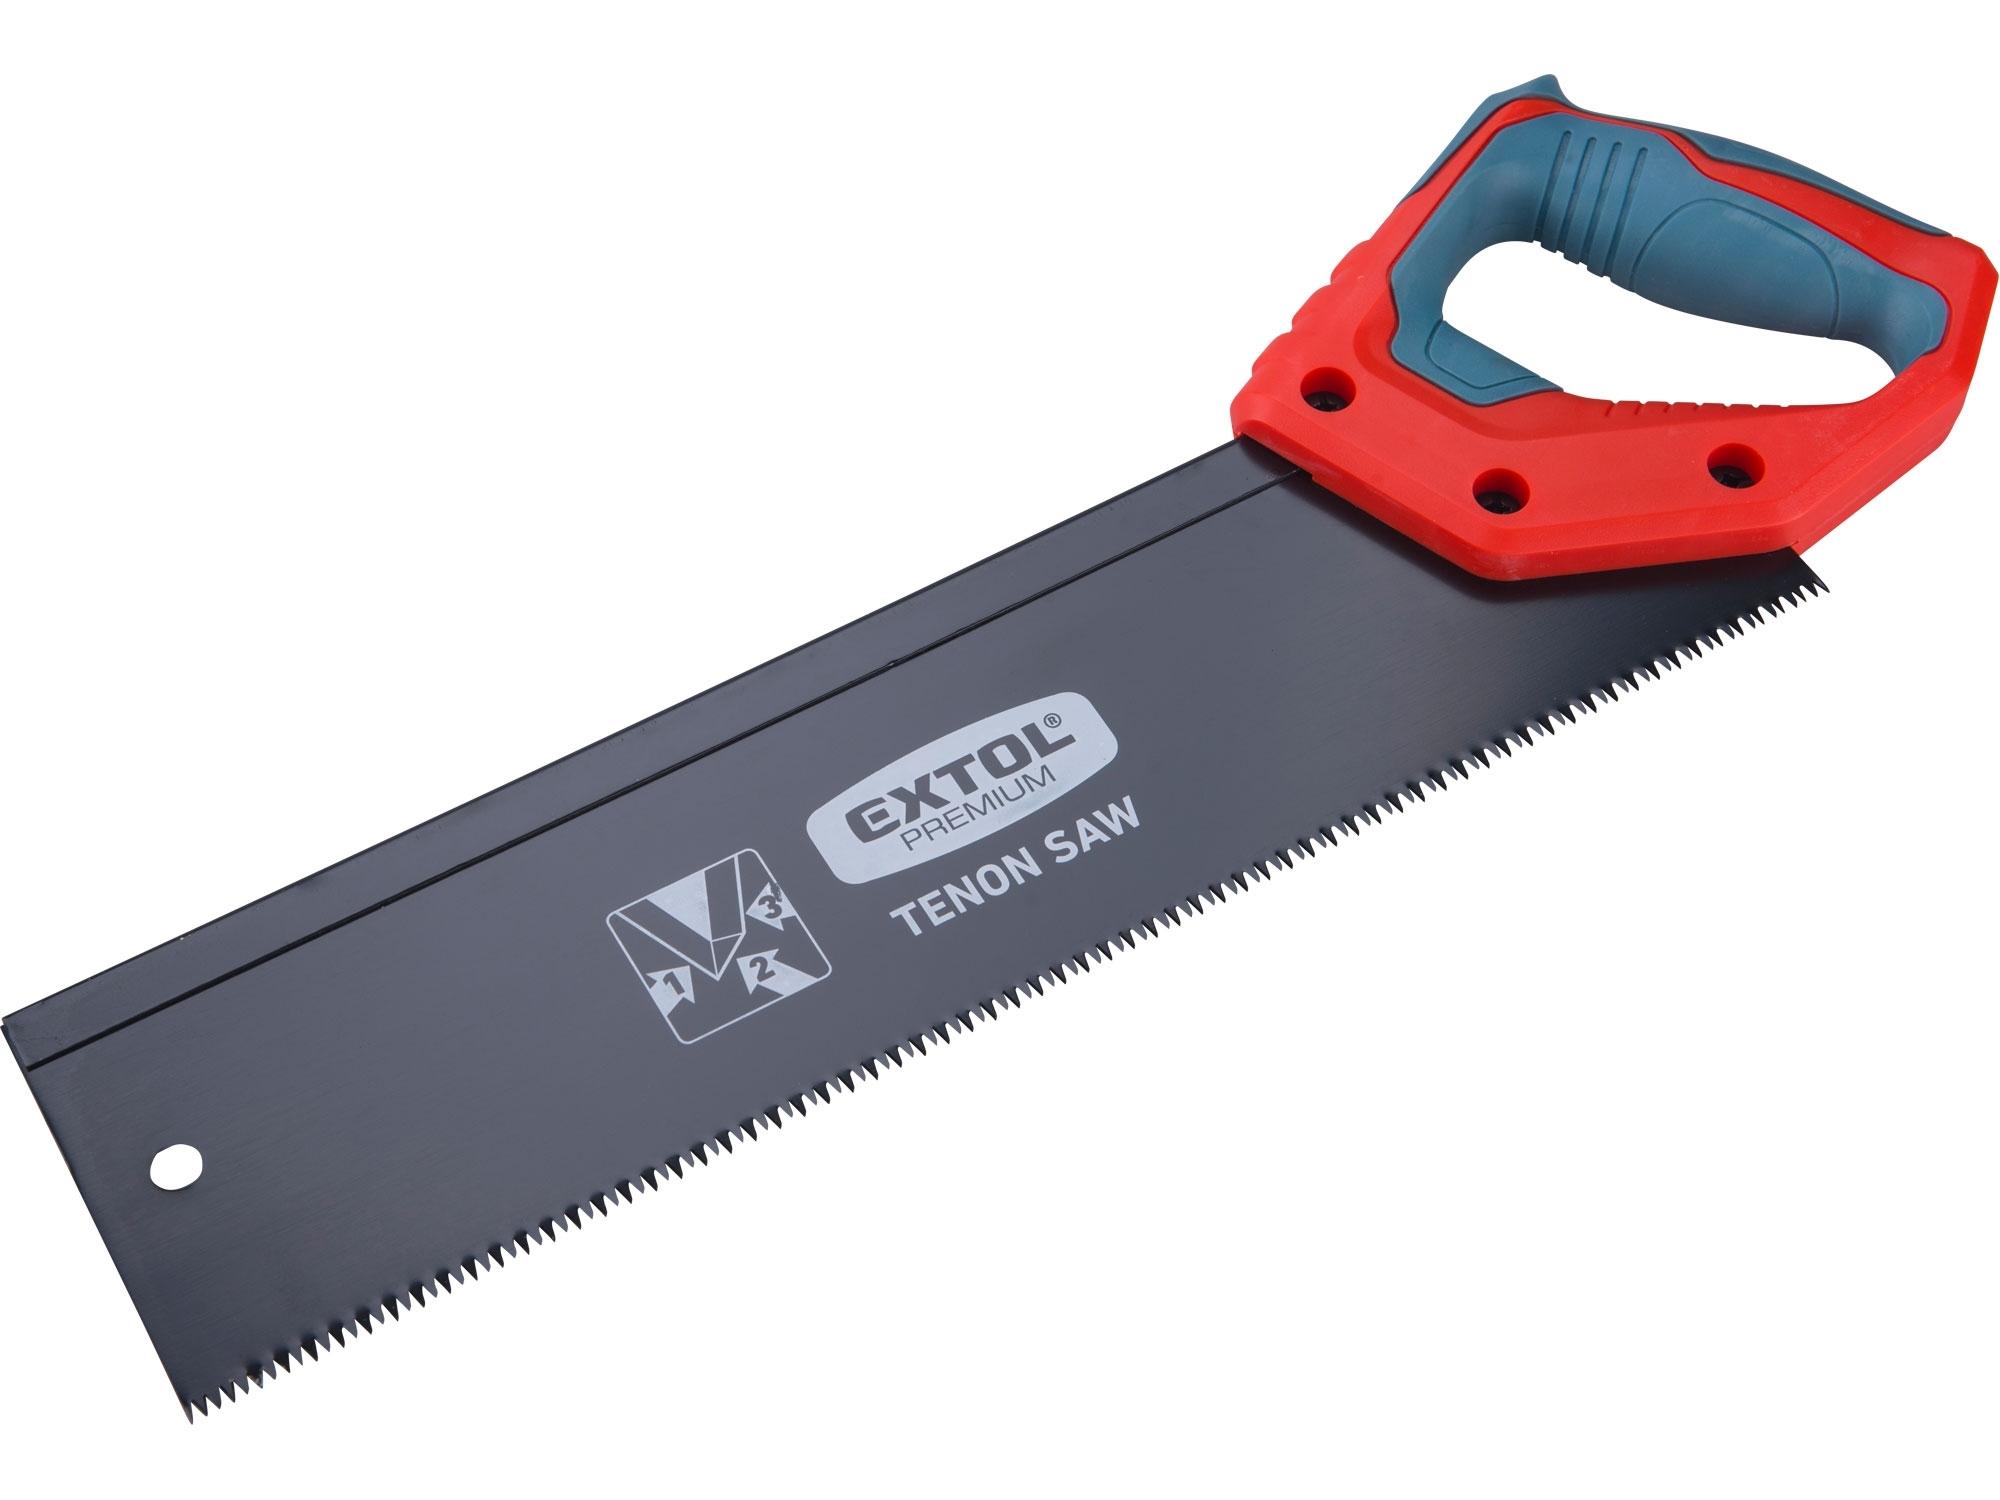 pila na dřevo - čepovka, 350mm, EXTOL PREMIUM 8812220